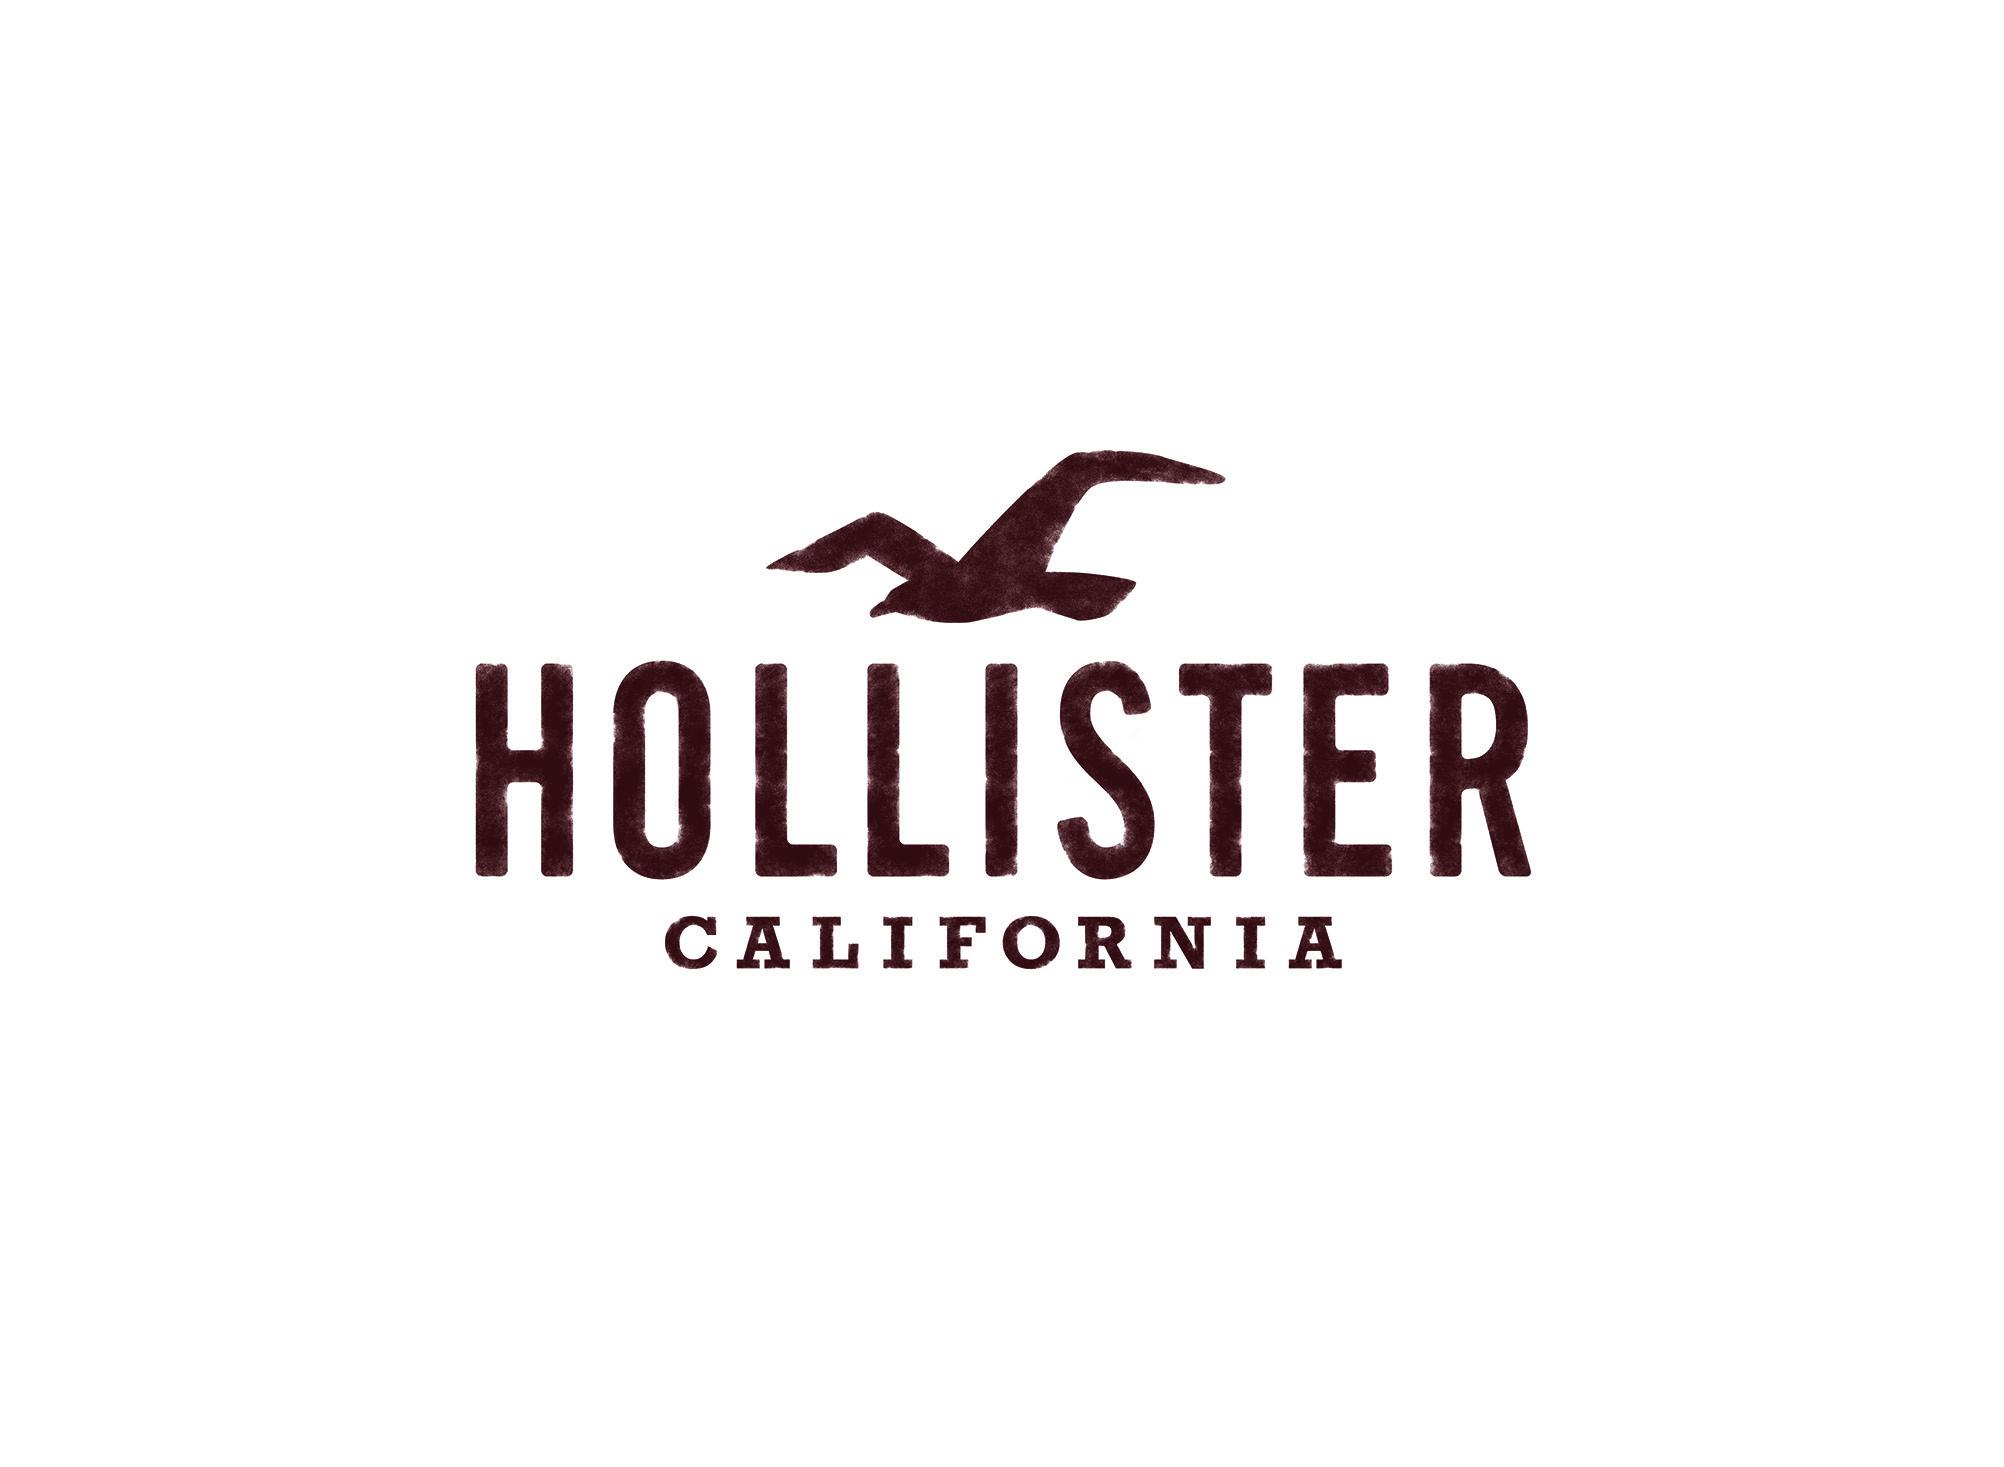 Hollister Logos